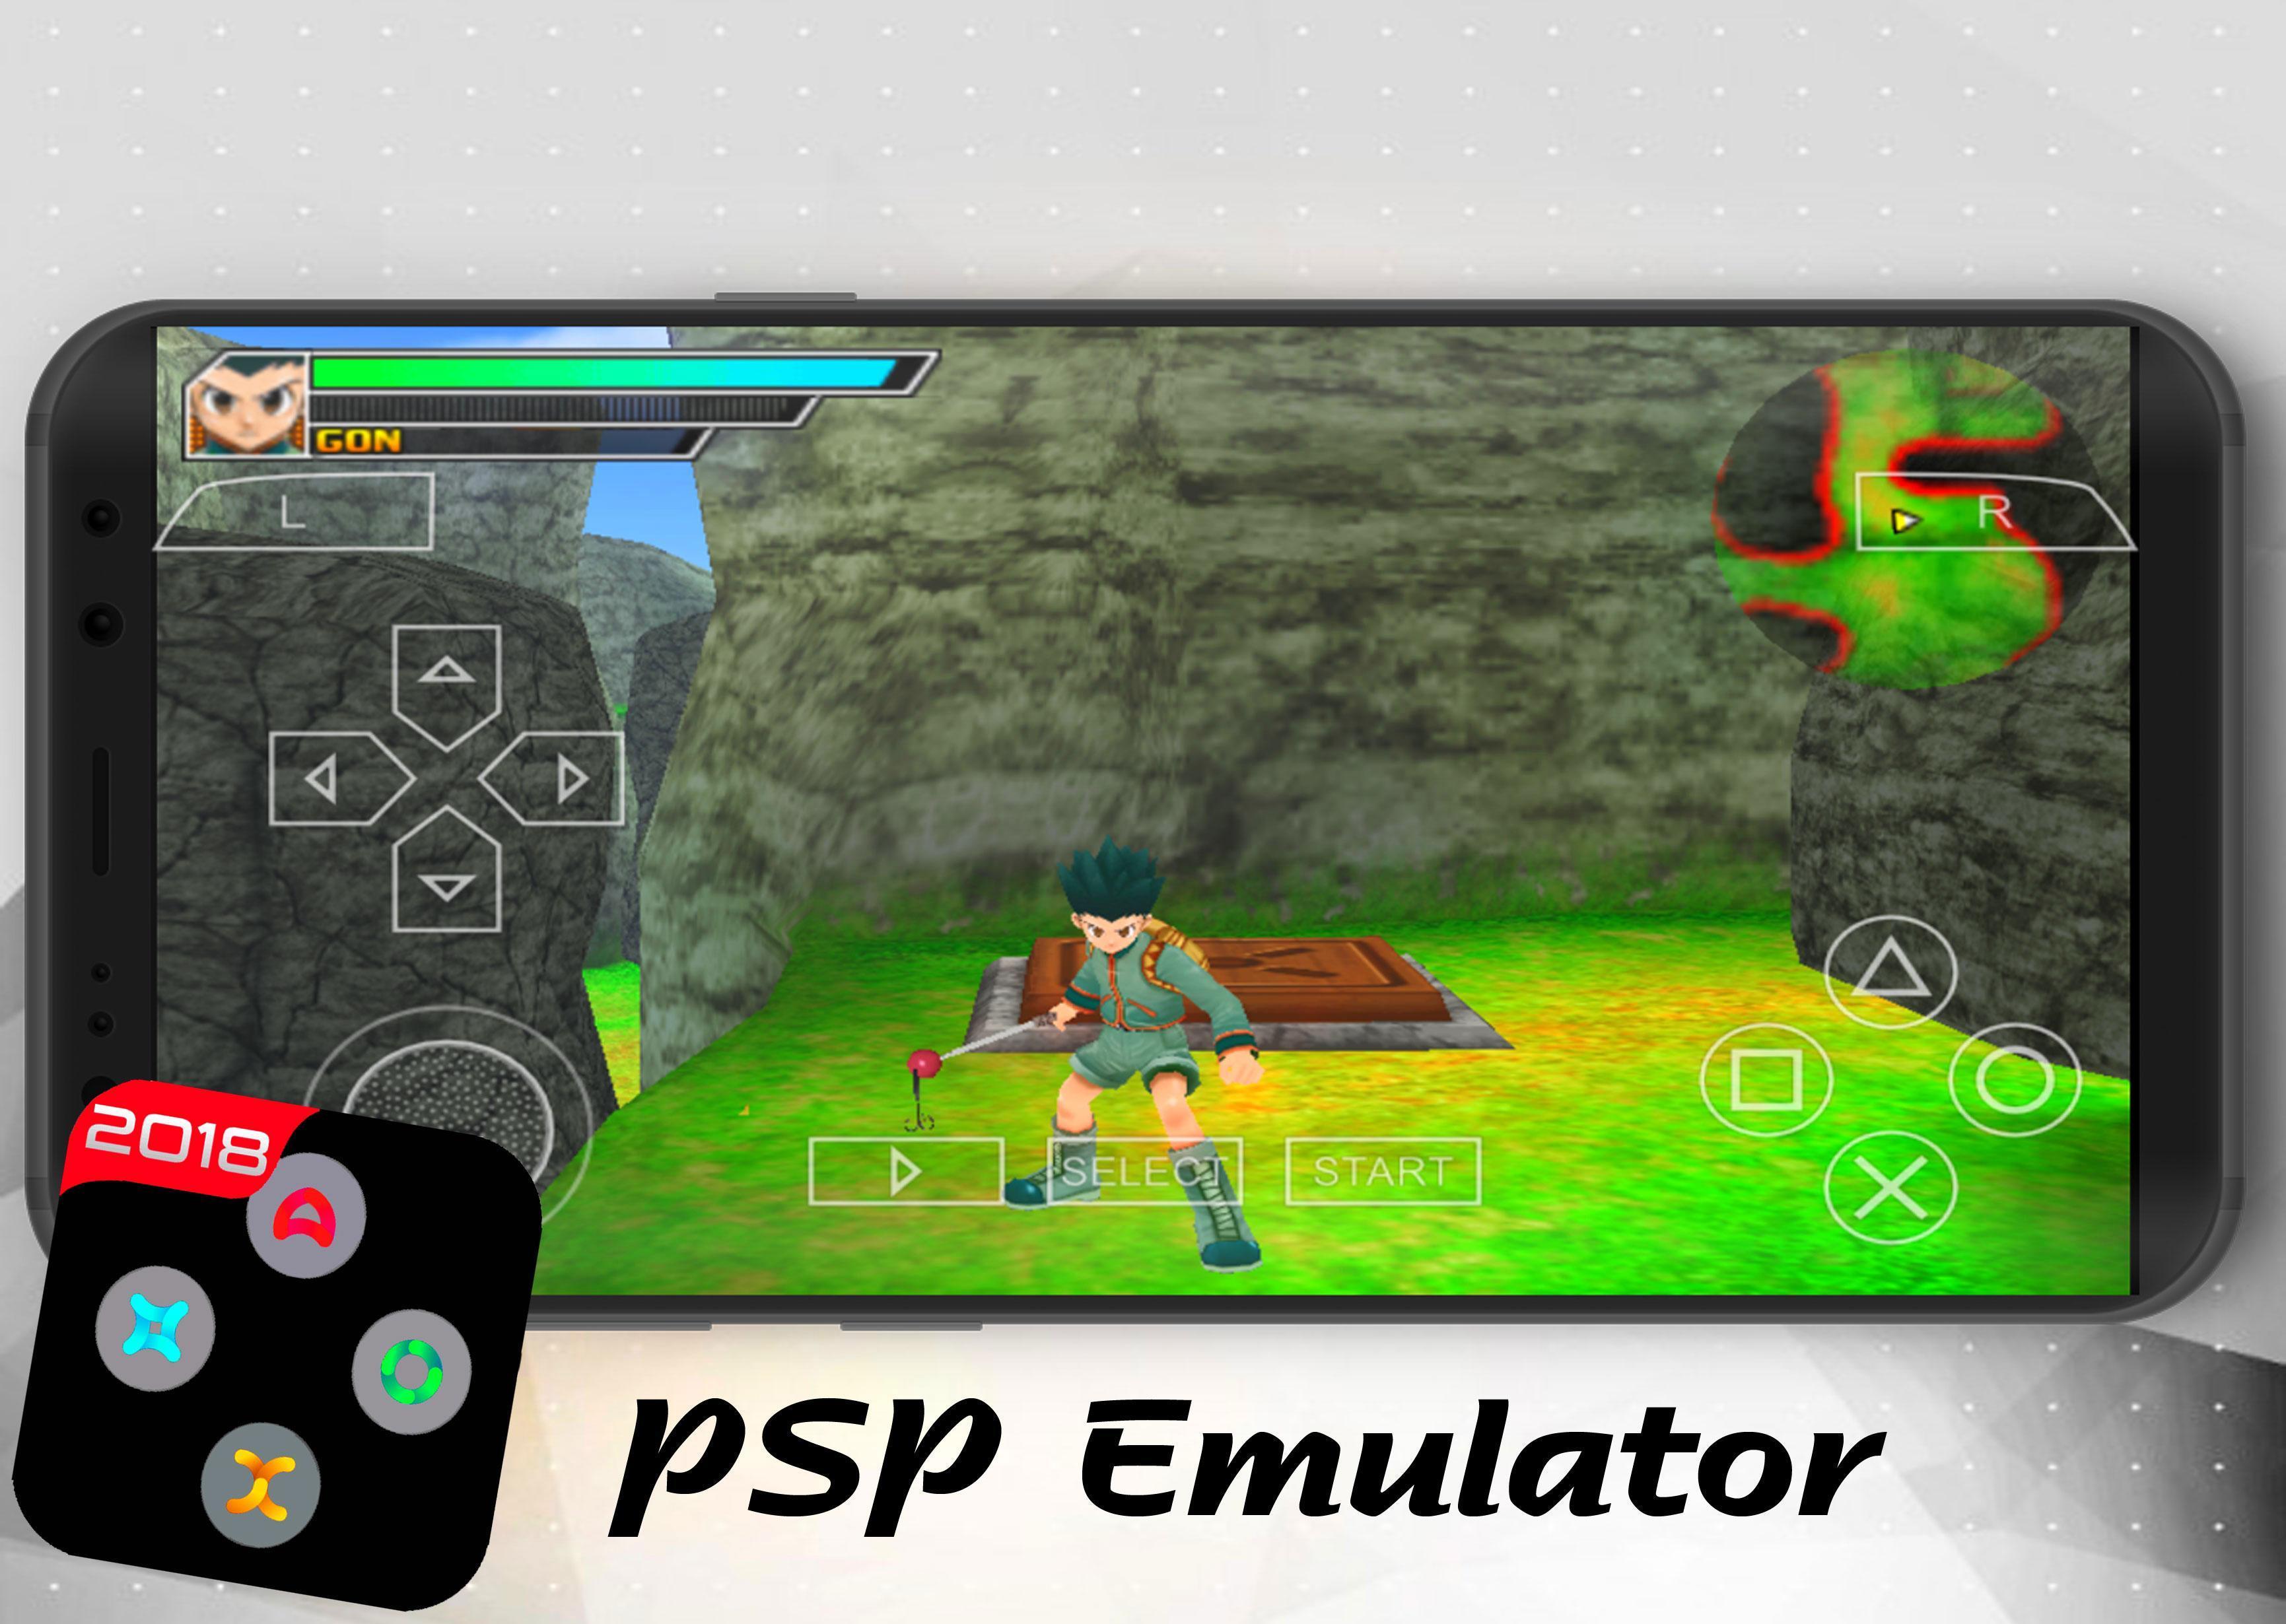 psp emulator for xbox 360 download